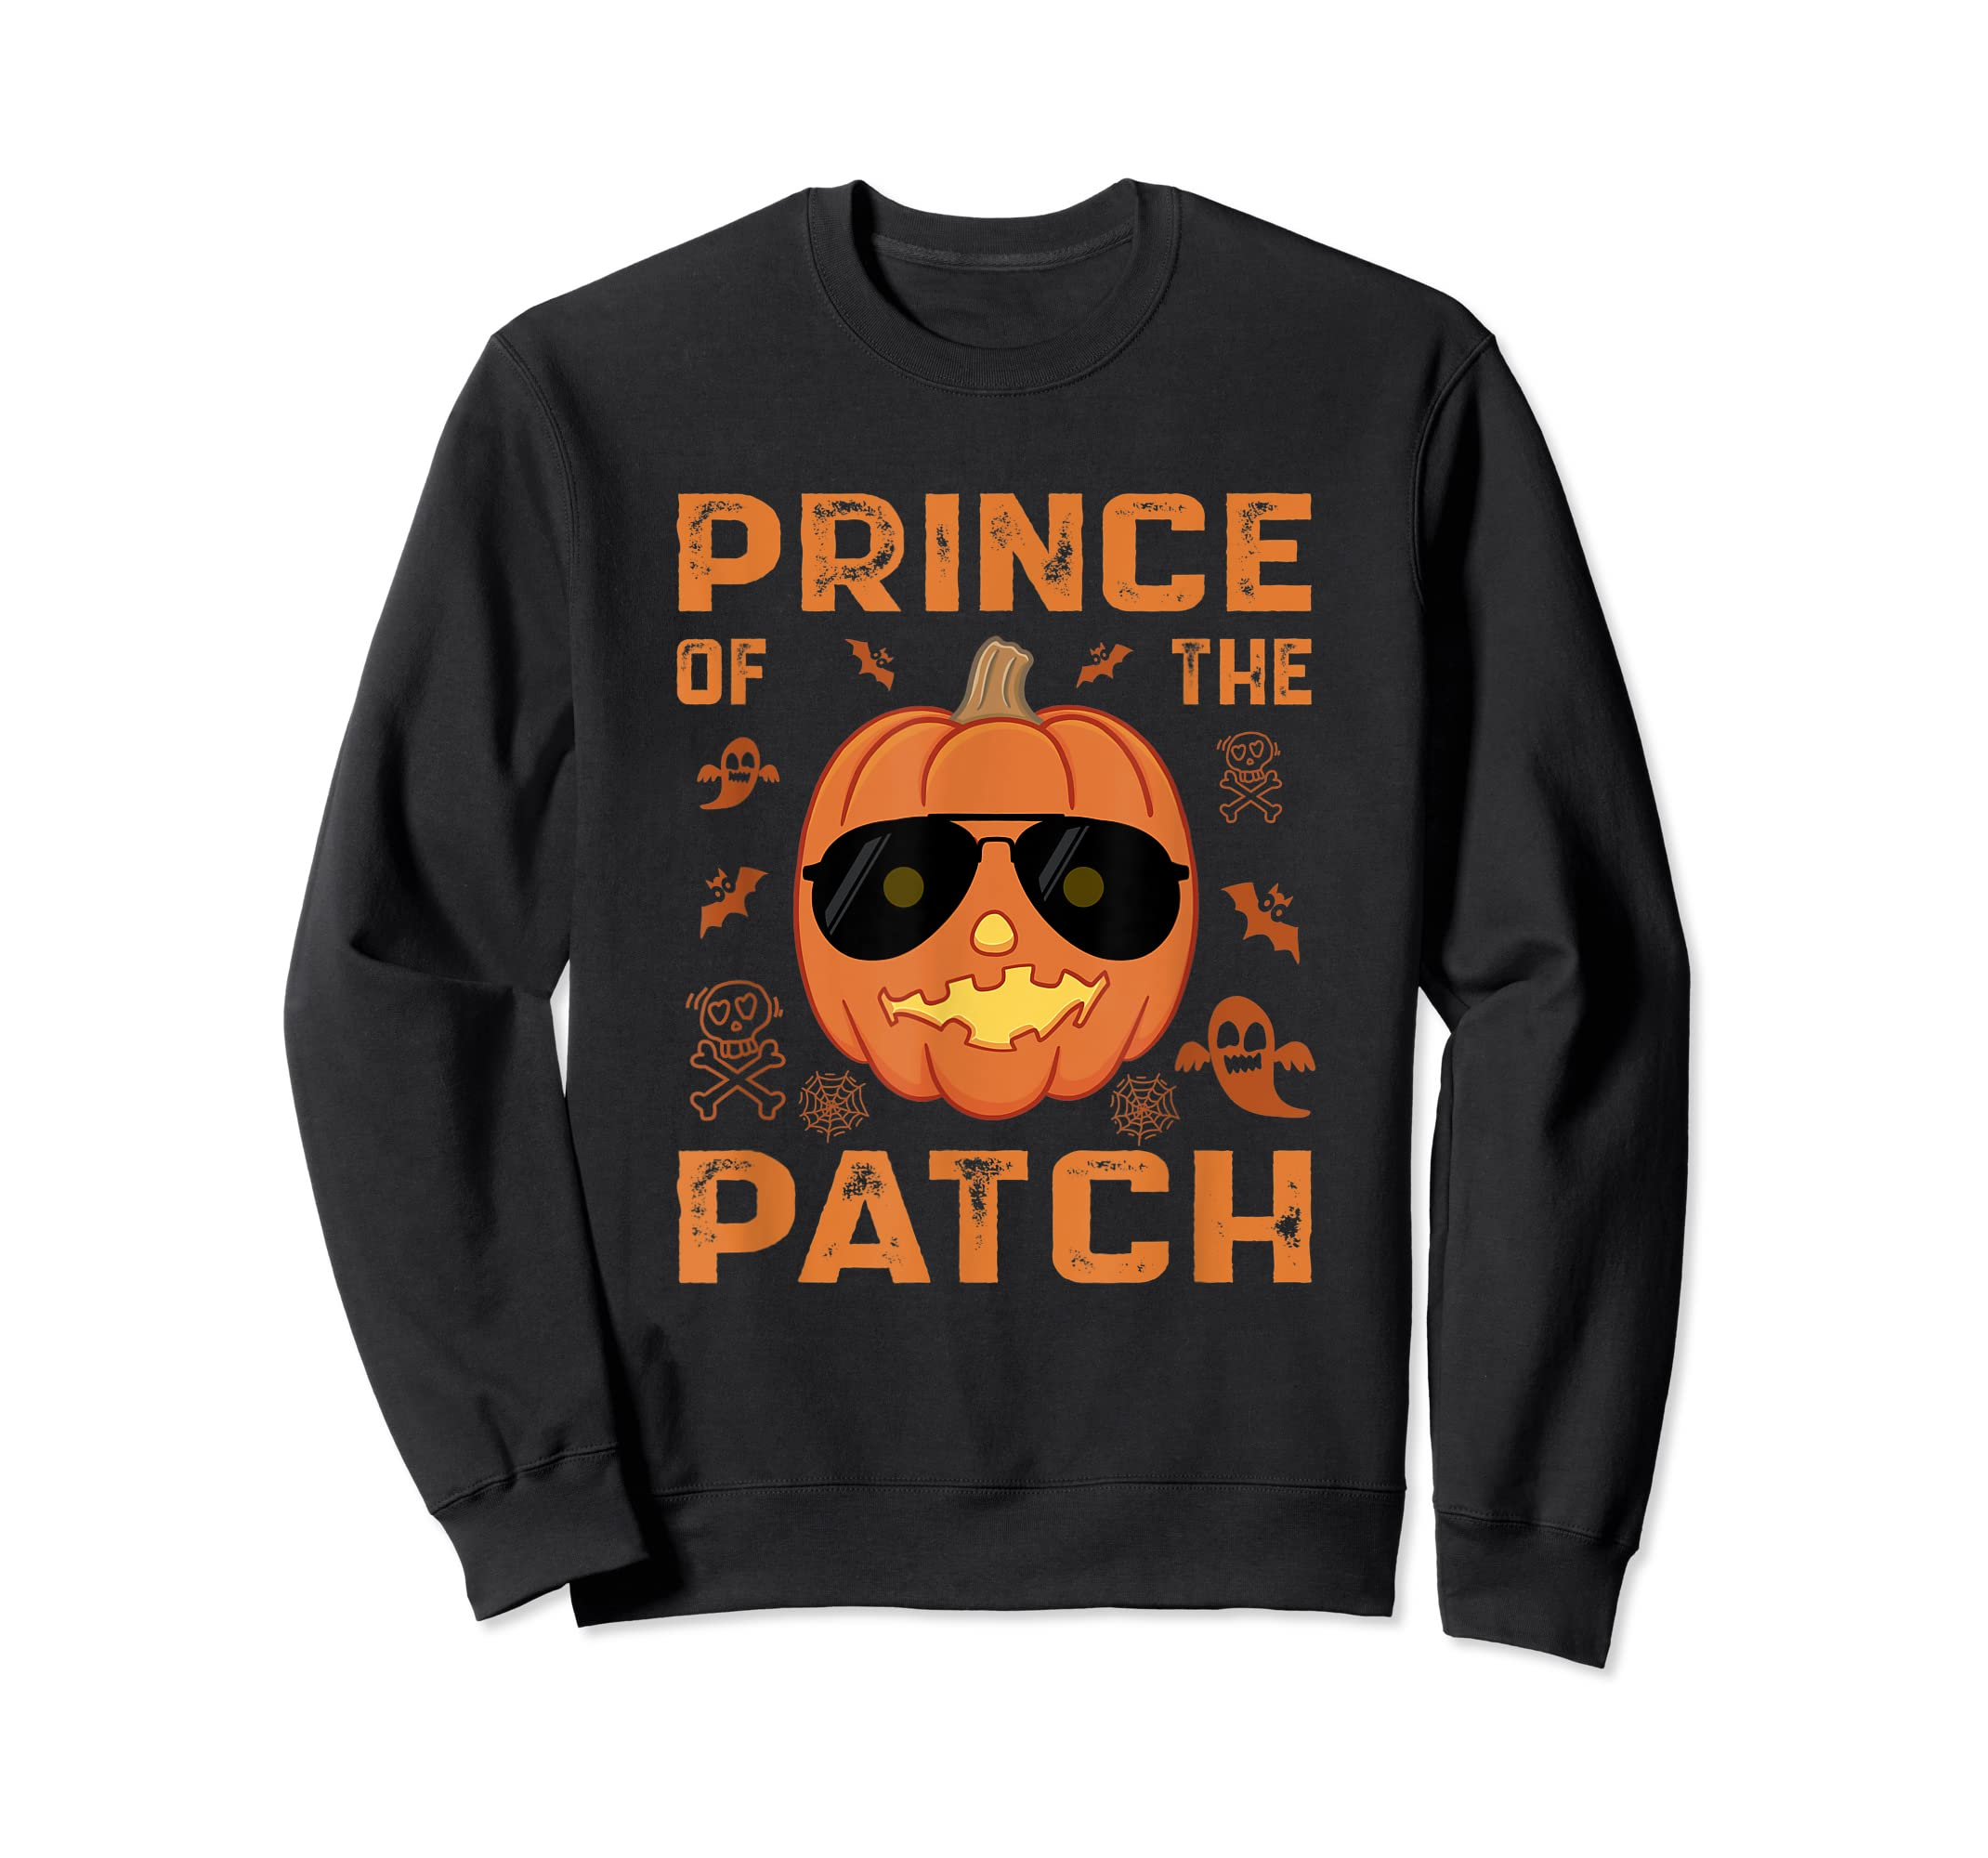 Pumpkin Prince of the Patch Group Family Halloween Costume T-Shirt-Sweatshirt-Black